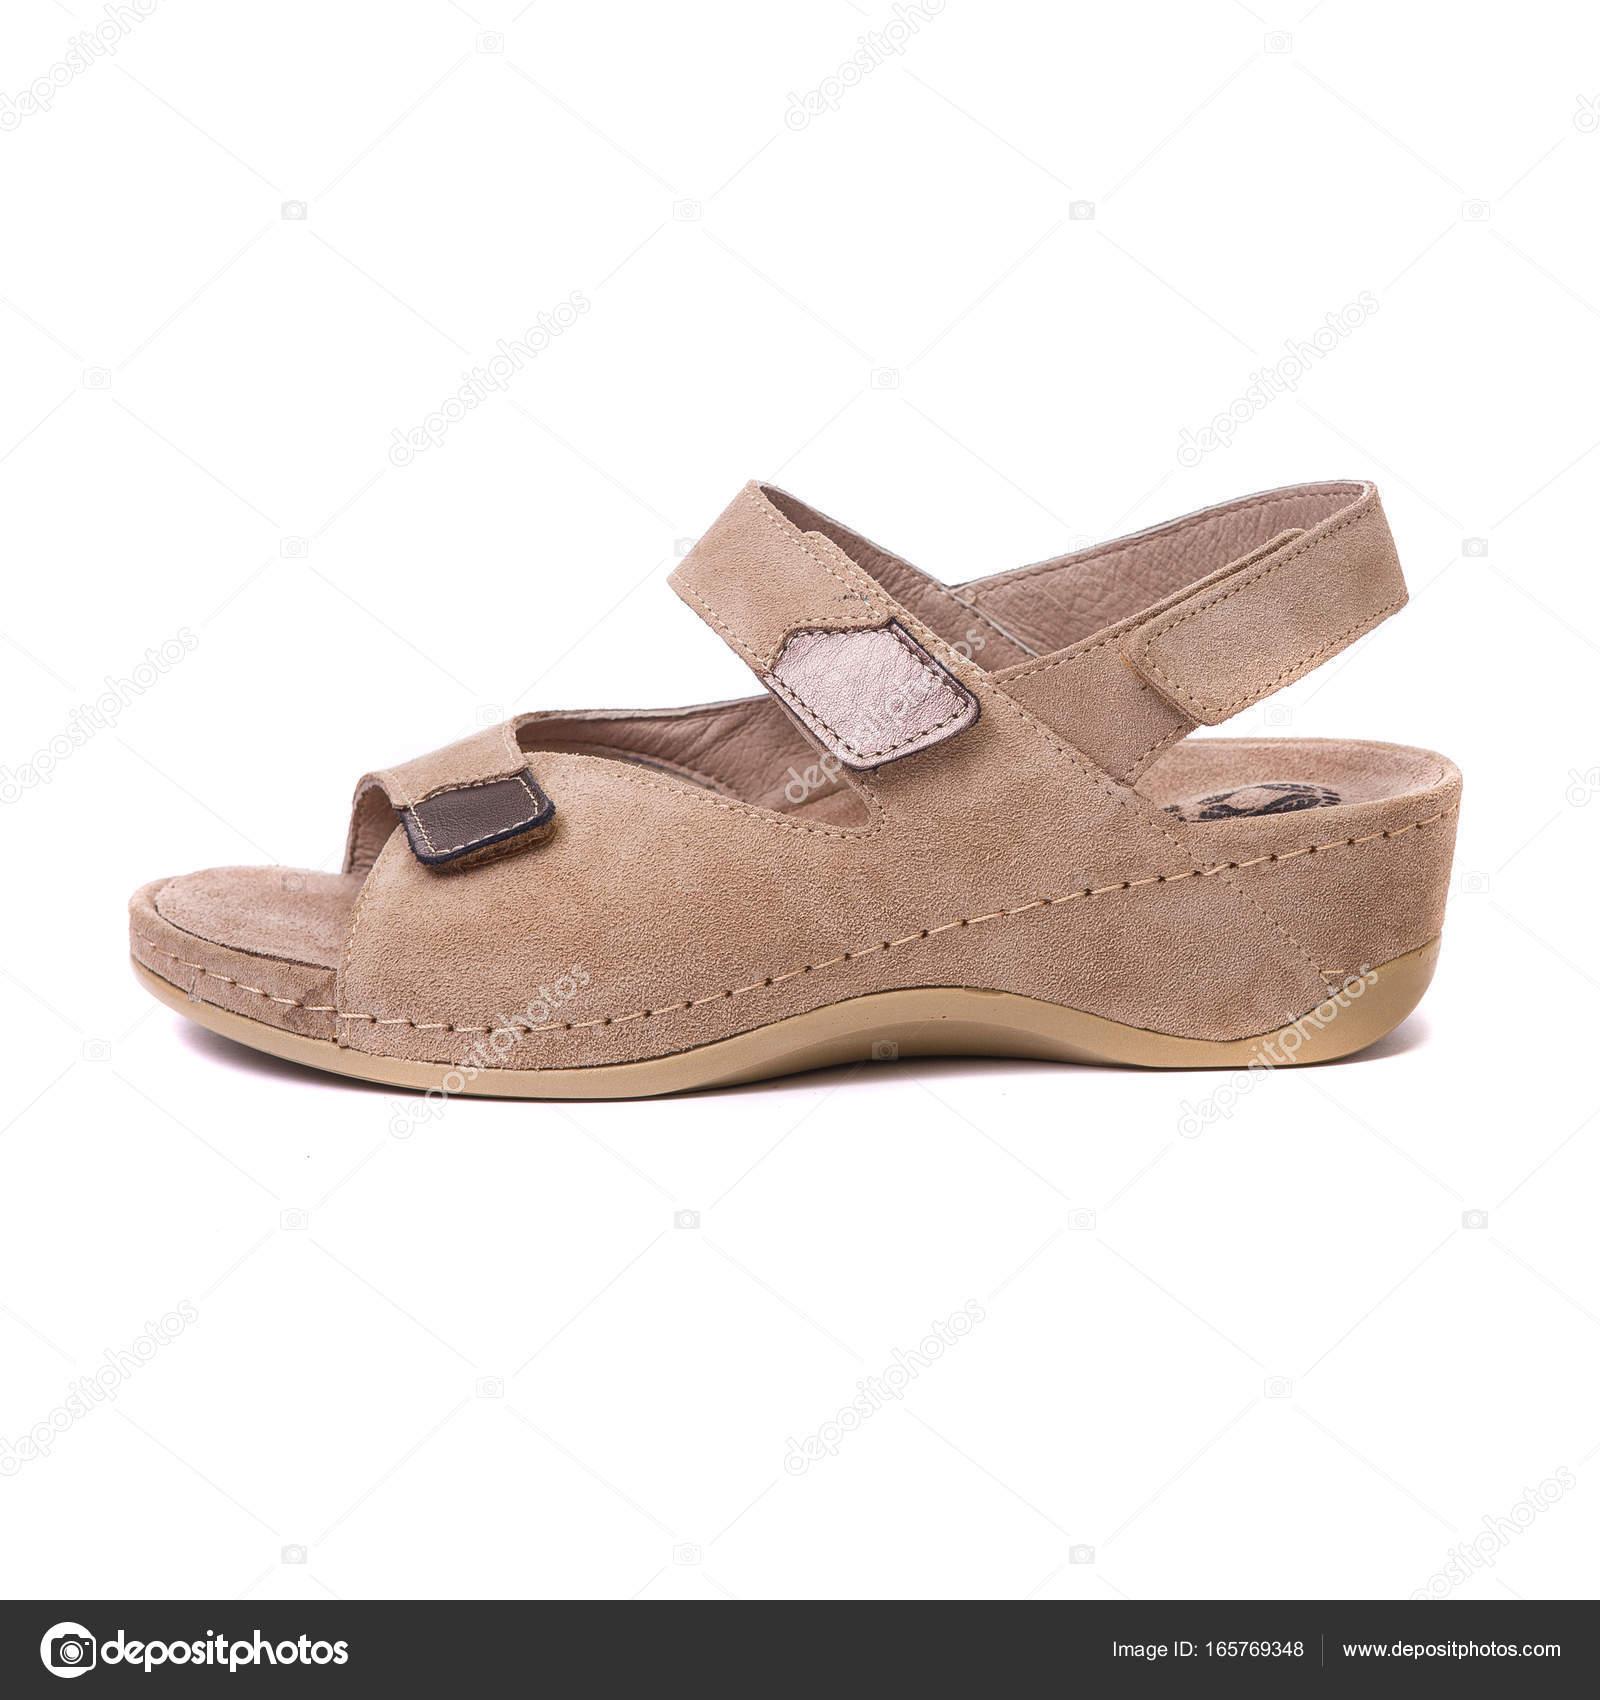 0333d9f9a Sapatos ortopédicos branco fundo isolado — Stock Photo © veloliza ...